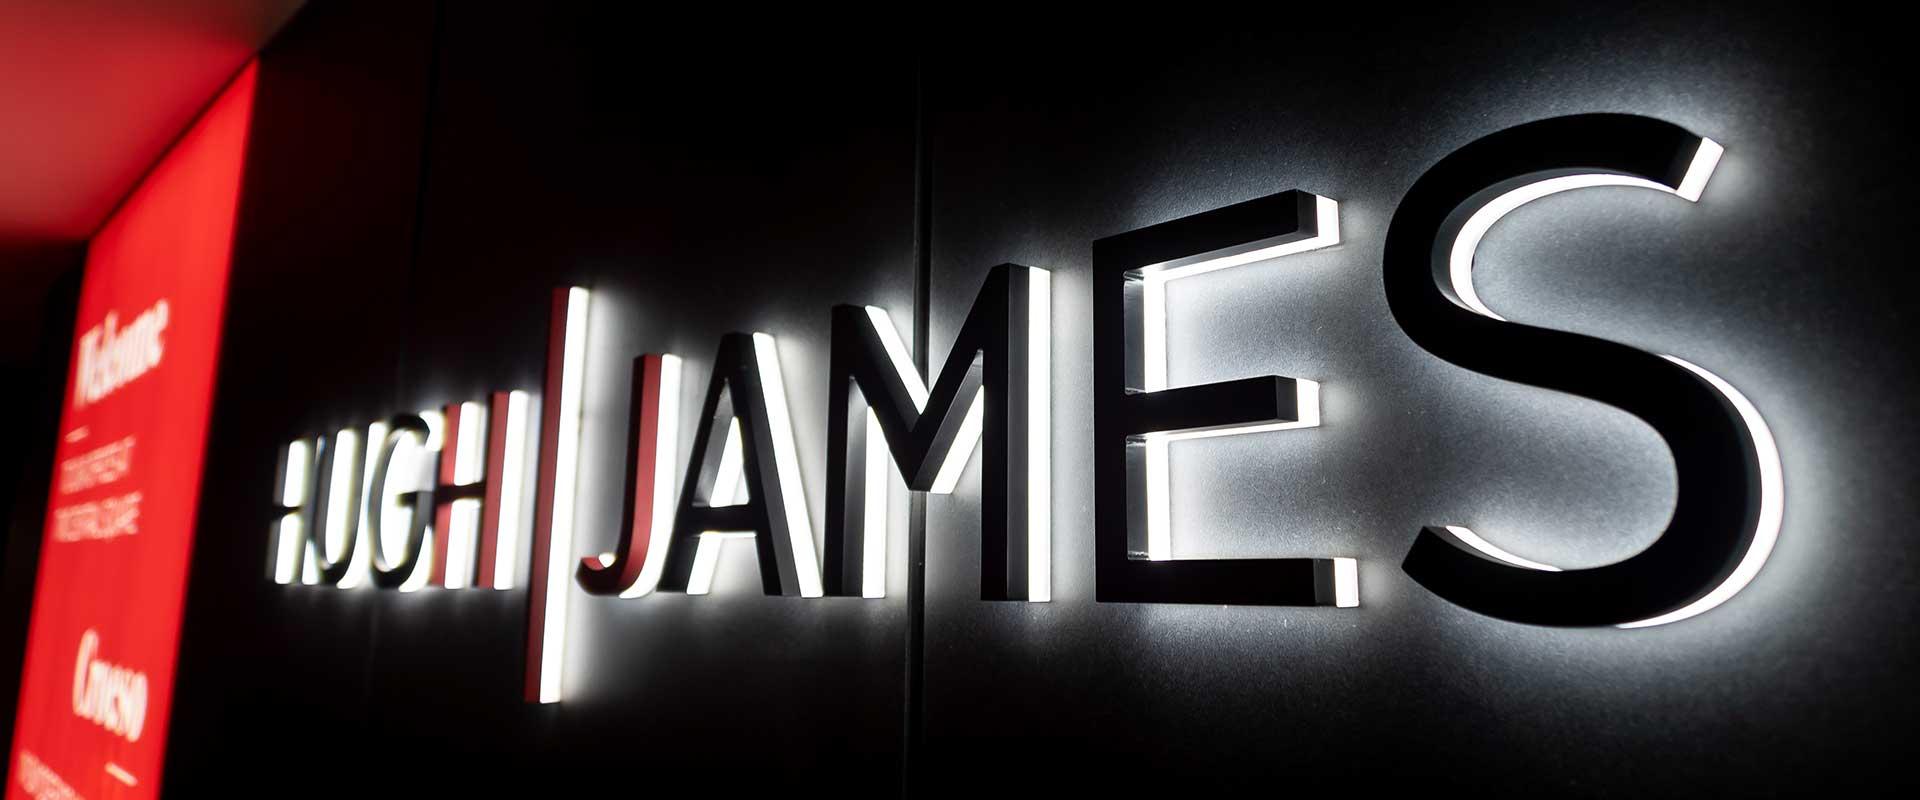 Huw James illuminated logo sign Cardiff